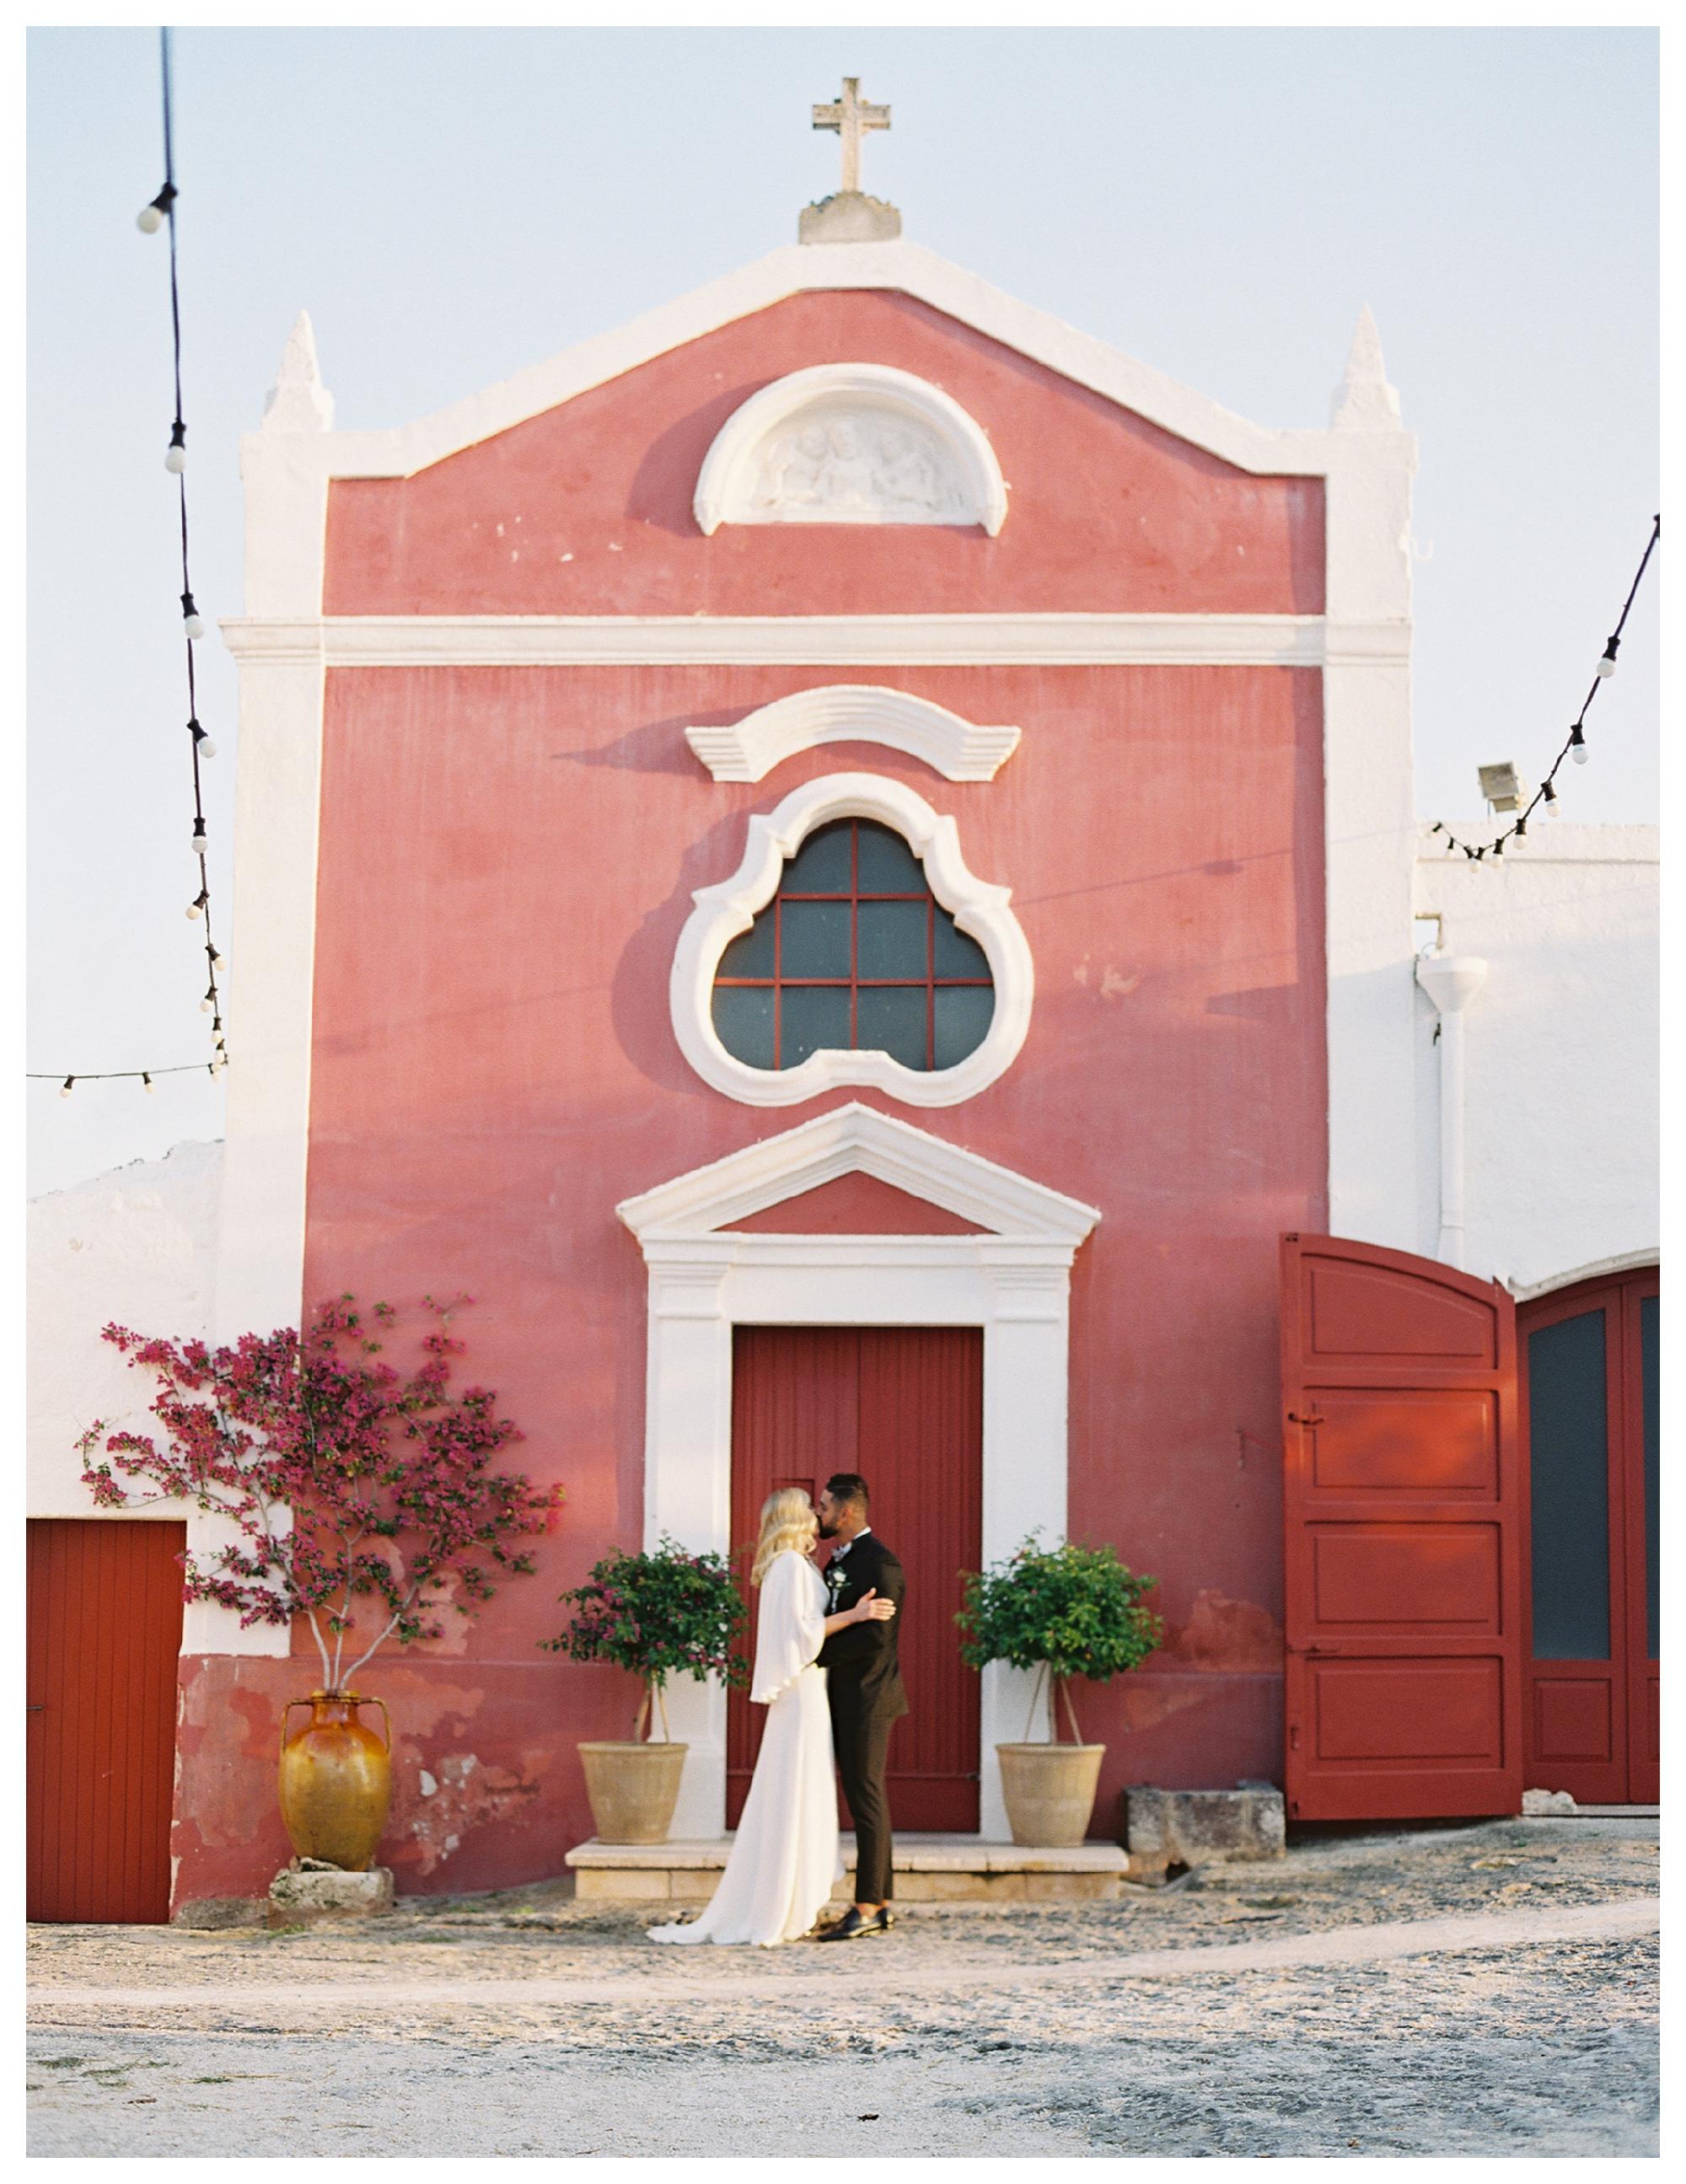 wedding kiss, wedding ceremony, masseria torre coccaro wedding, italy wedding, puglia wedding venue, alexandra grecco wedding dress, bride and groom